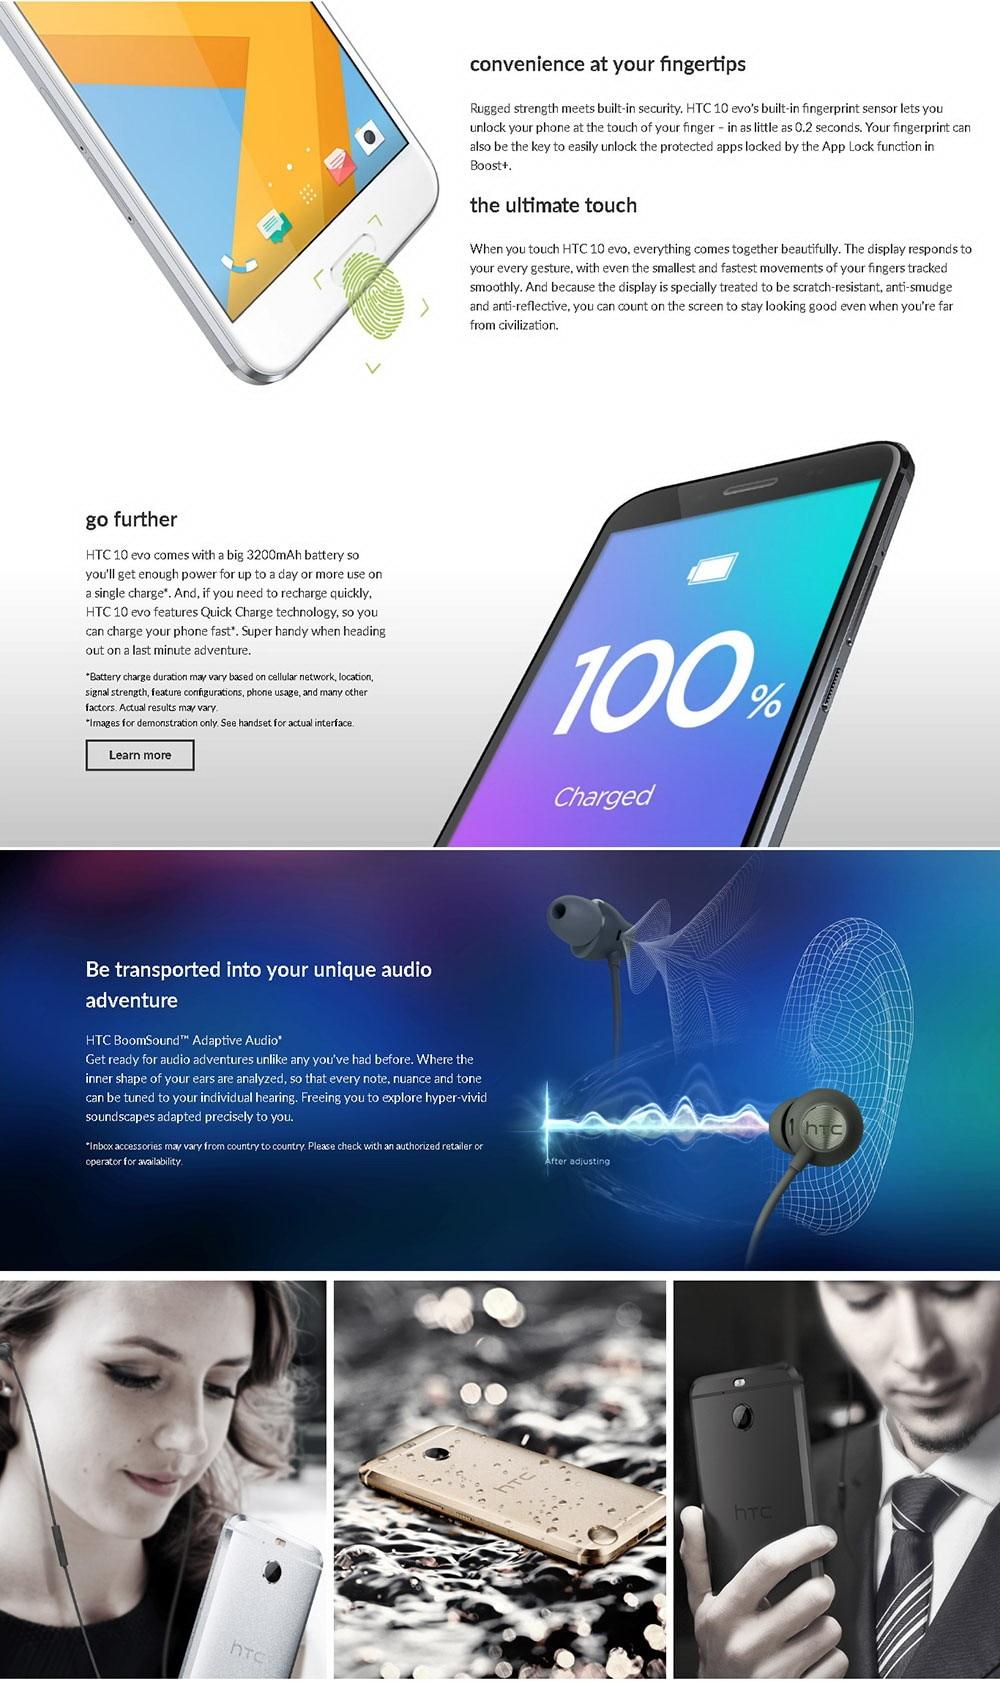 HTC-10-evo_04